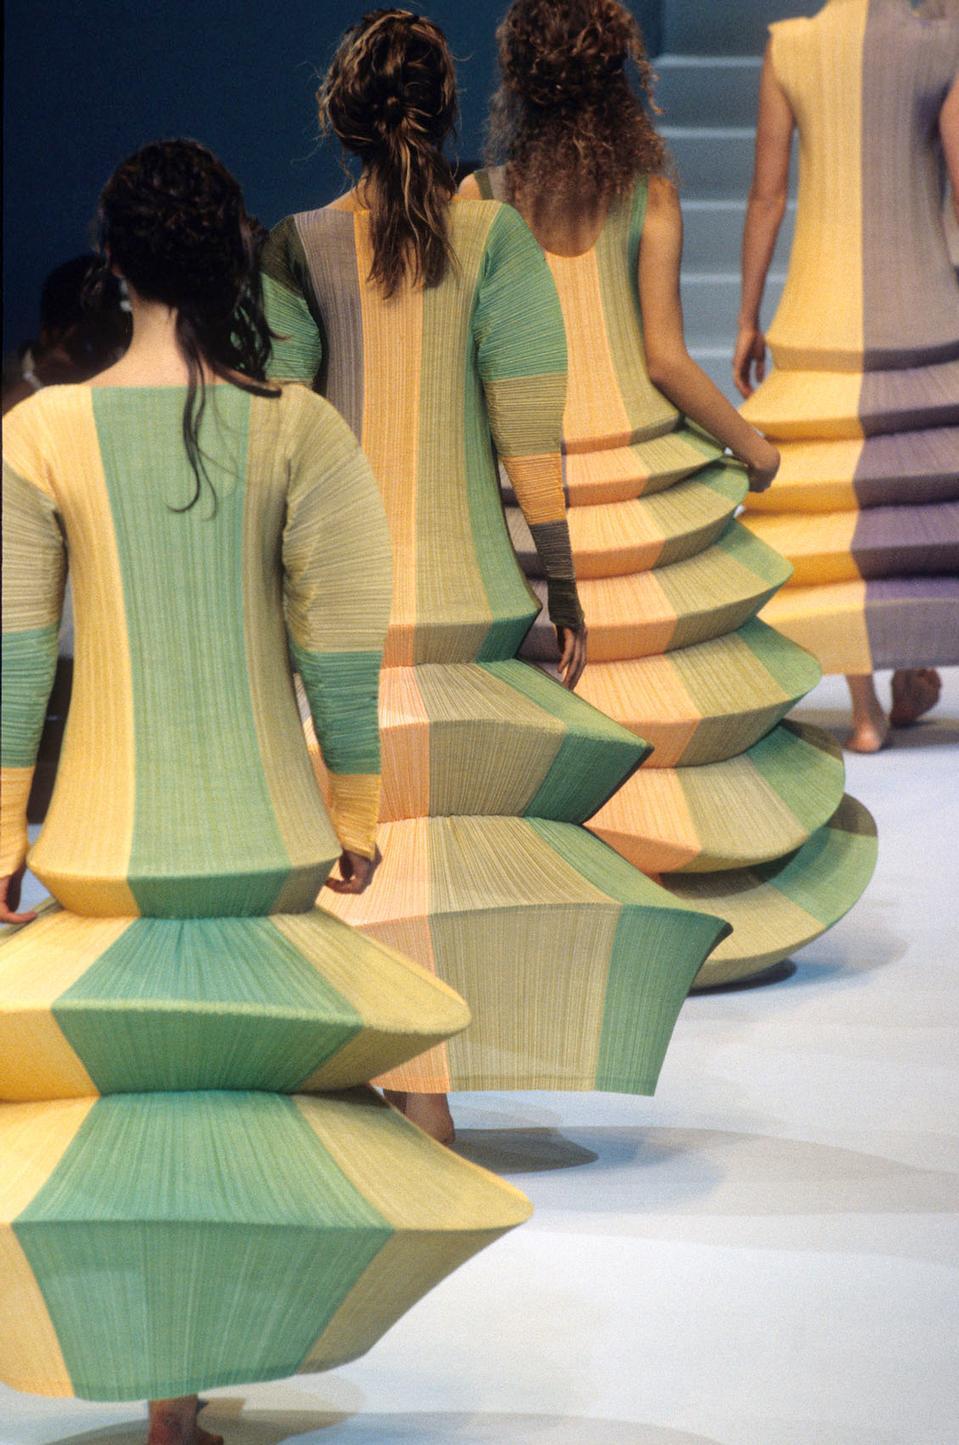 ıssey Flying Saucer dress